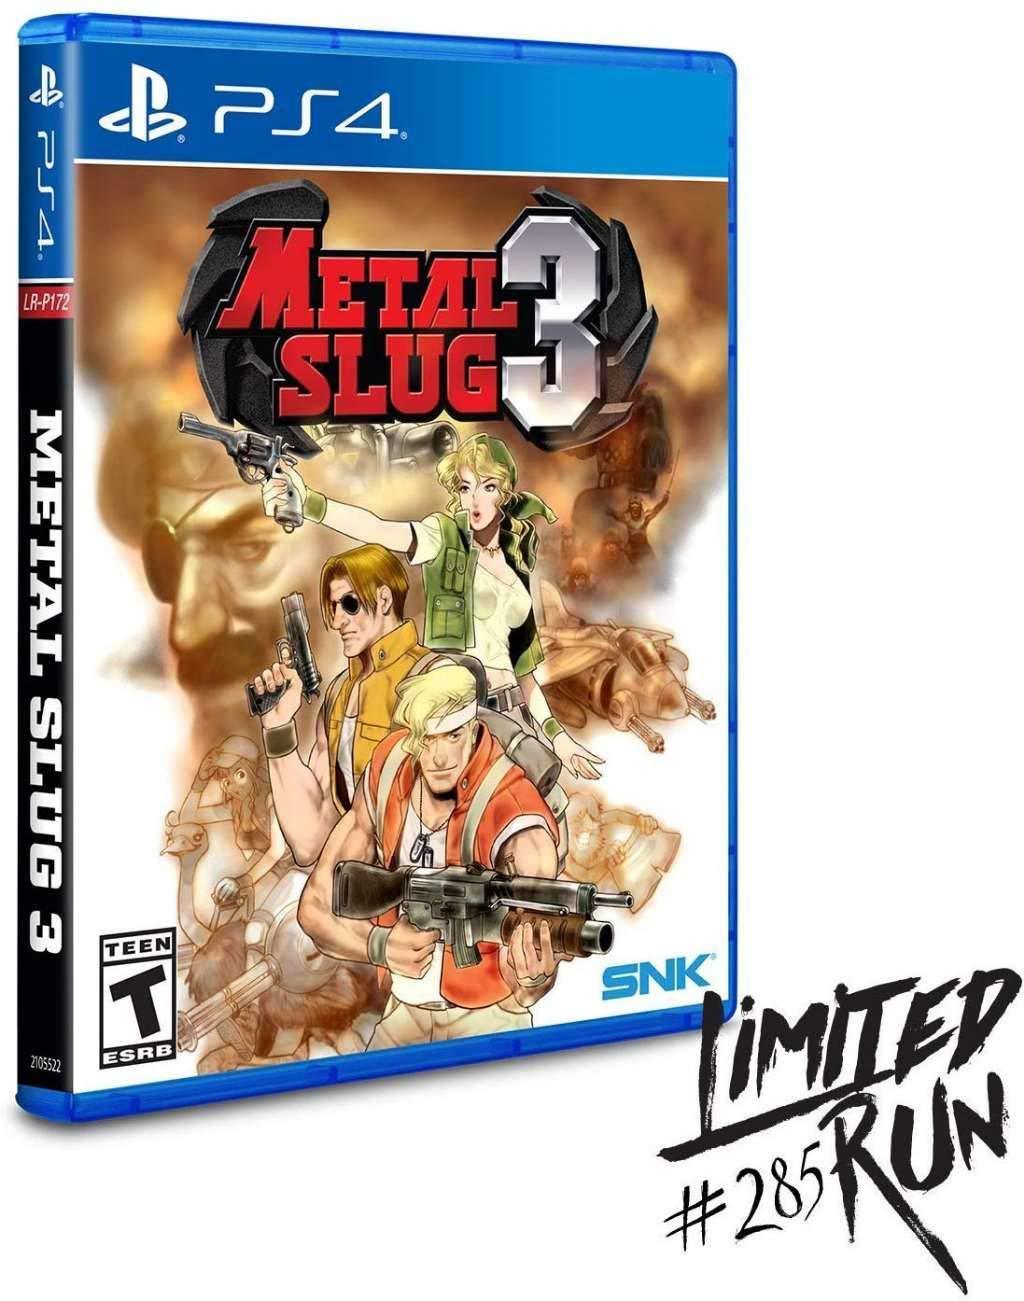 Amazon.com: Metal Slug III PS4: Video Games